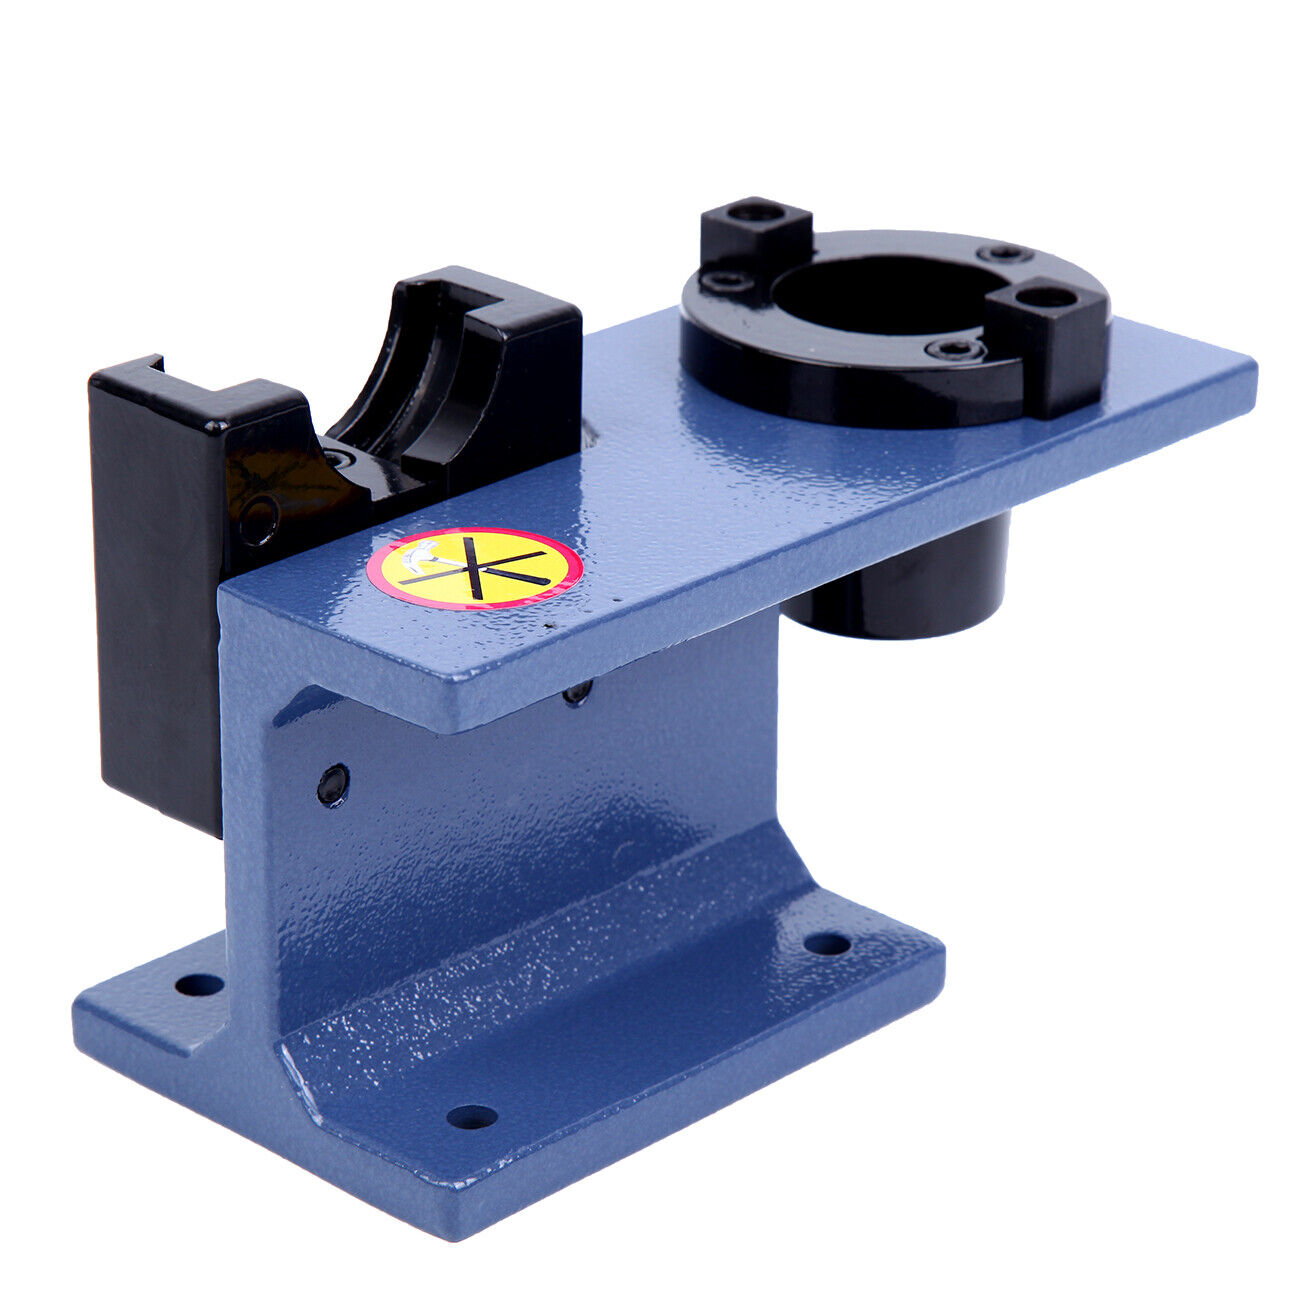 CAT40 Universal CNC Tool Holder Tightening Fixture Clamping